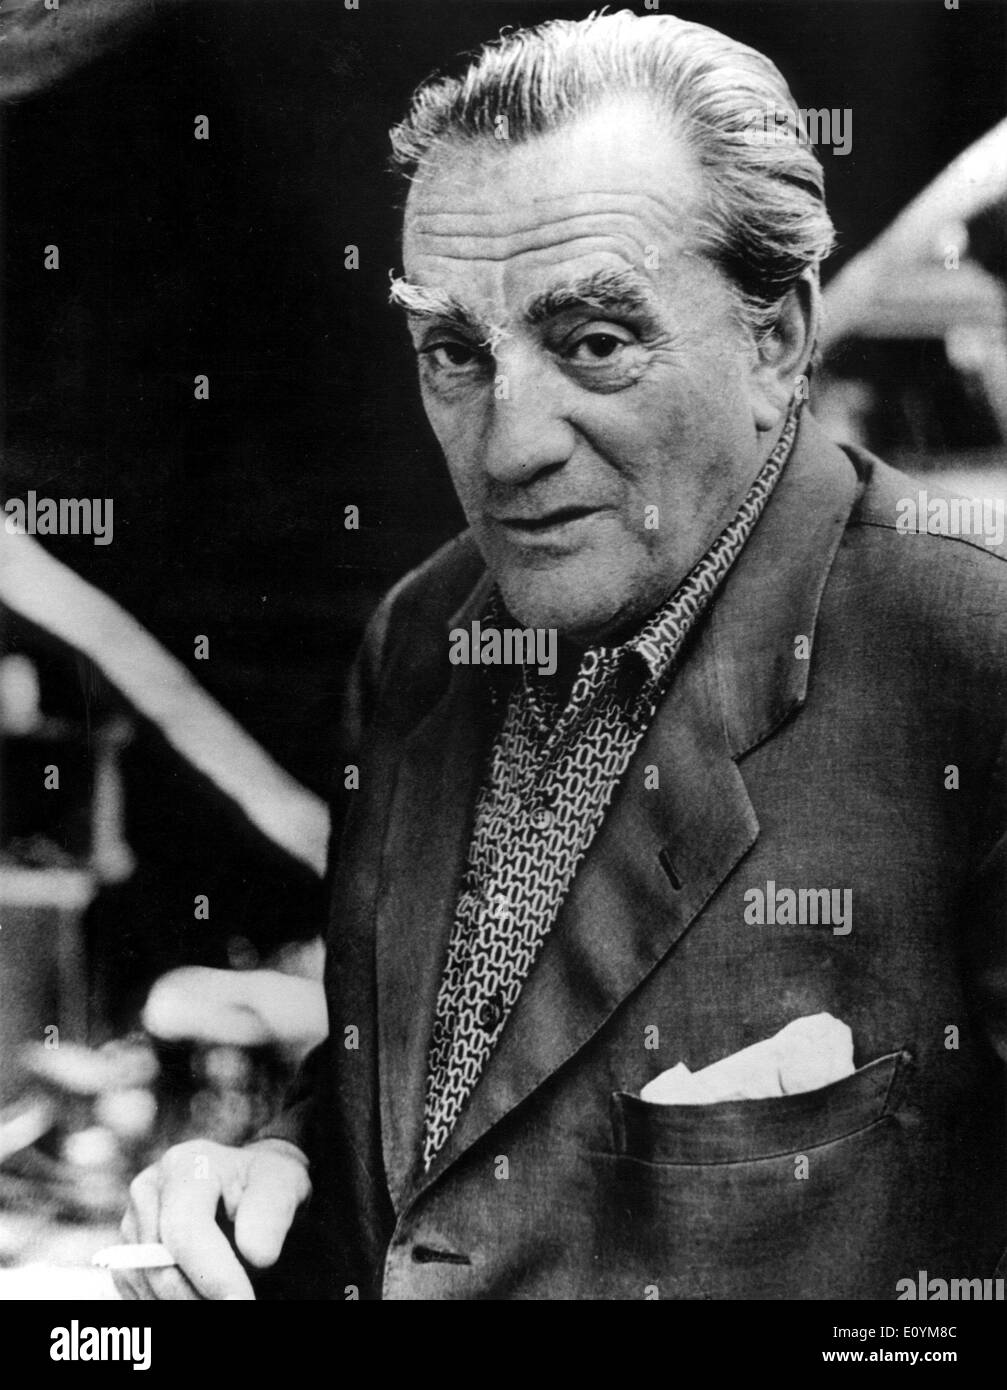 Retrato del director de cine Luchino Visconti Foto de stock